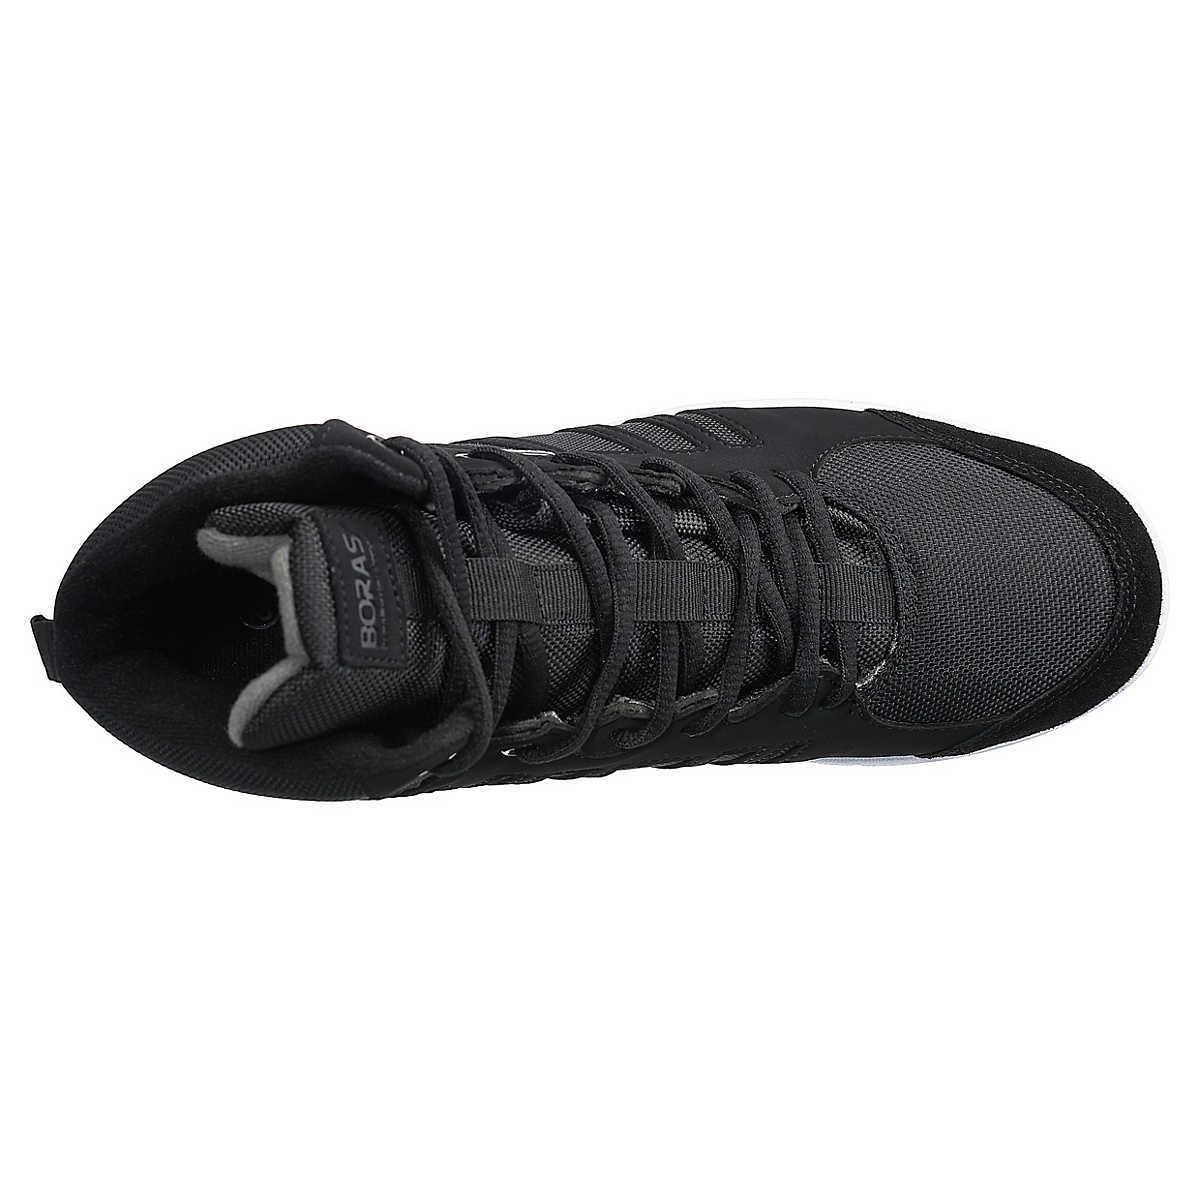 Boras radical MID Chaussures Hommes Hi-top taille Baskets, Chaussures de sport, taille Hi-top 42, noir 36430c